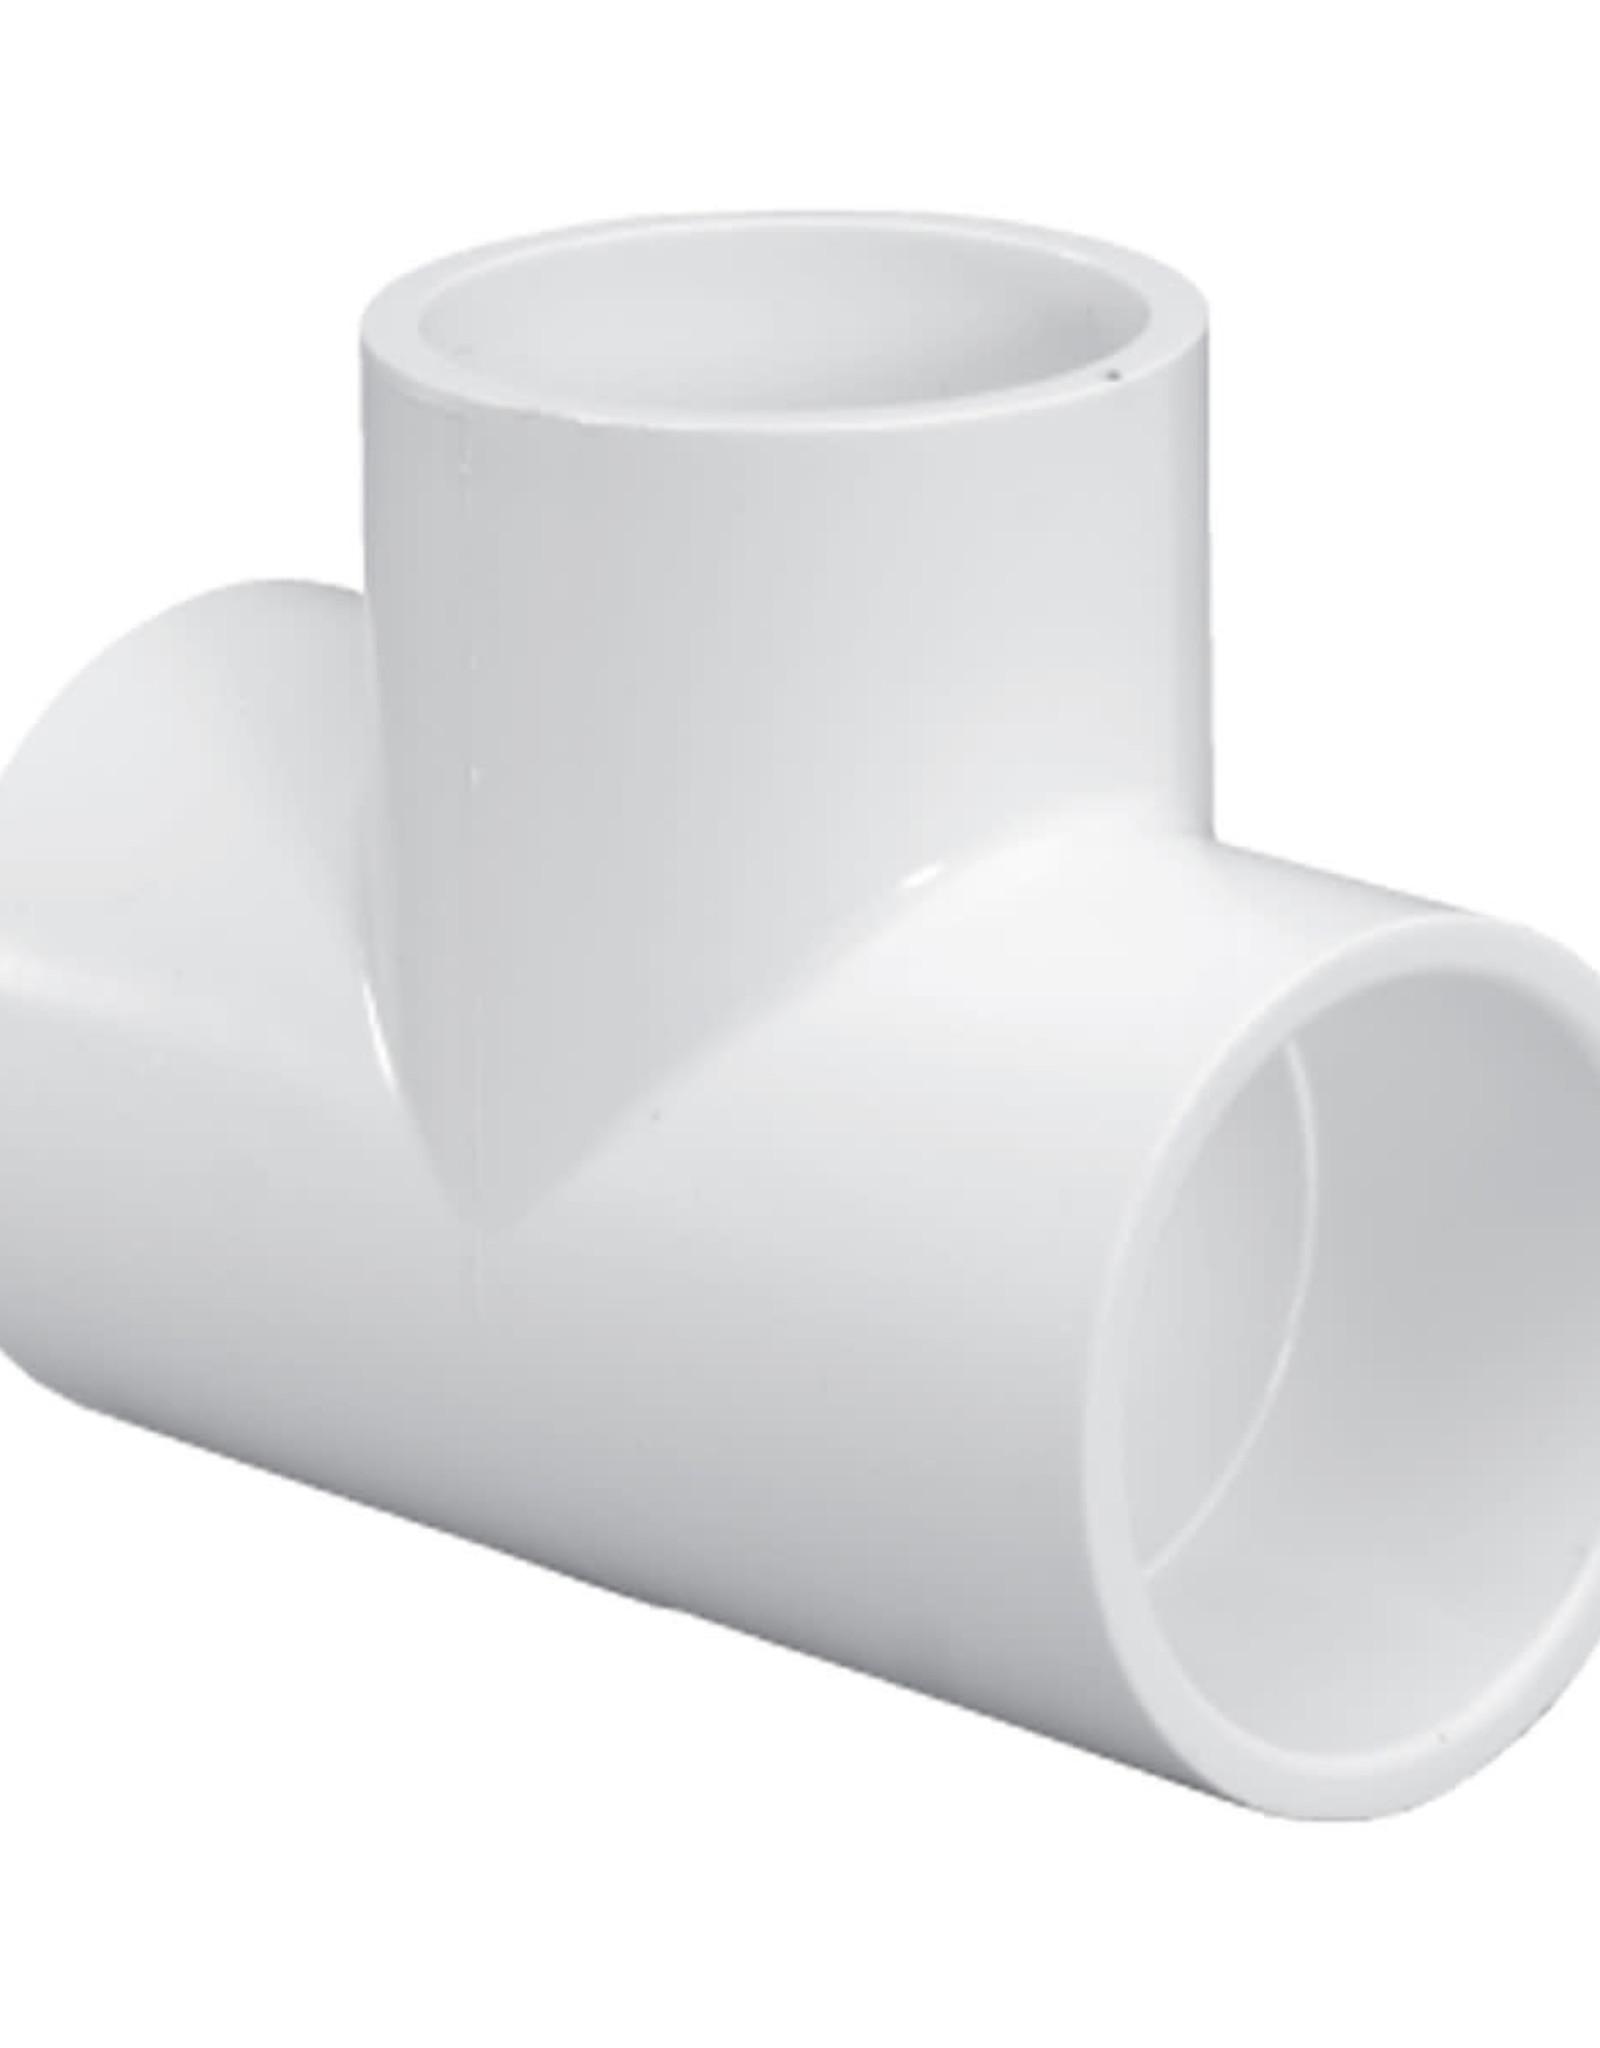 "Charlotte Pipe & Foundry PVC 2"" Tee Slip X Slip X Slip SCH 40 Pressure"